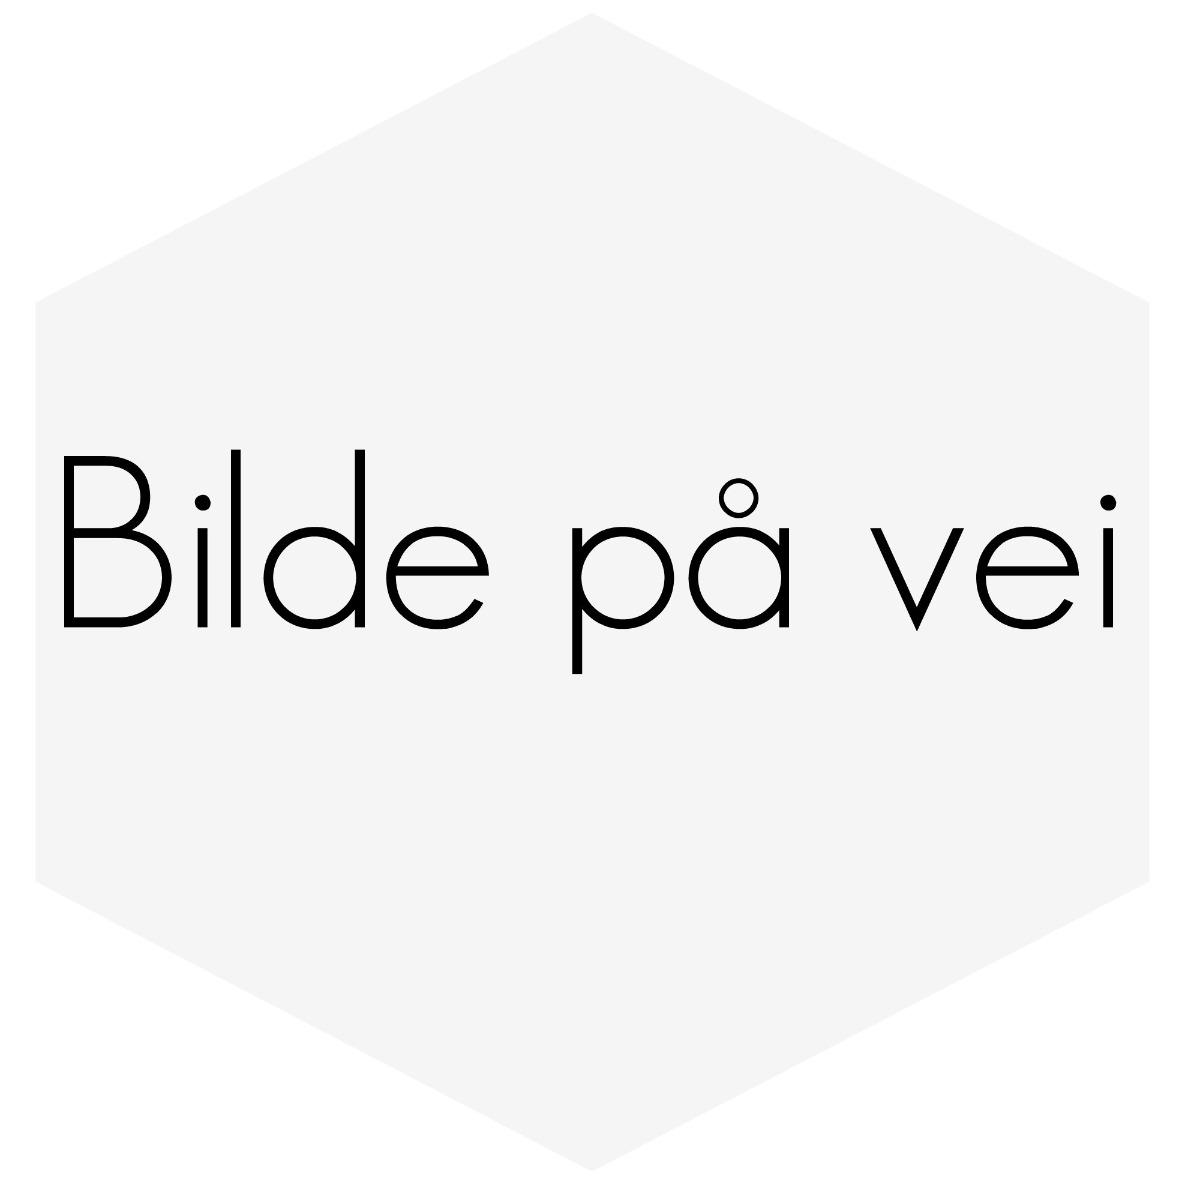 "SILIKONSLANGE RØD REDUSERING 3-3,5"" (76-89MM)"